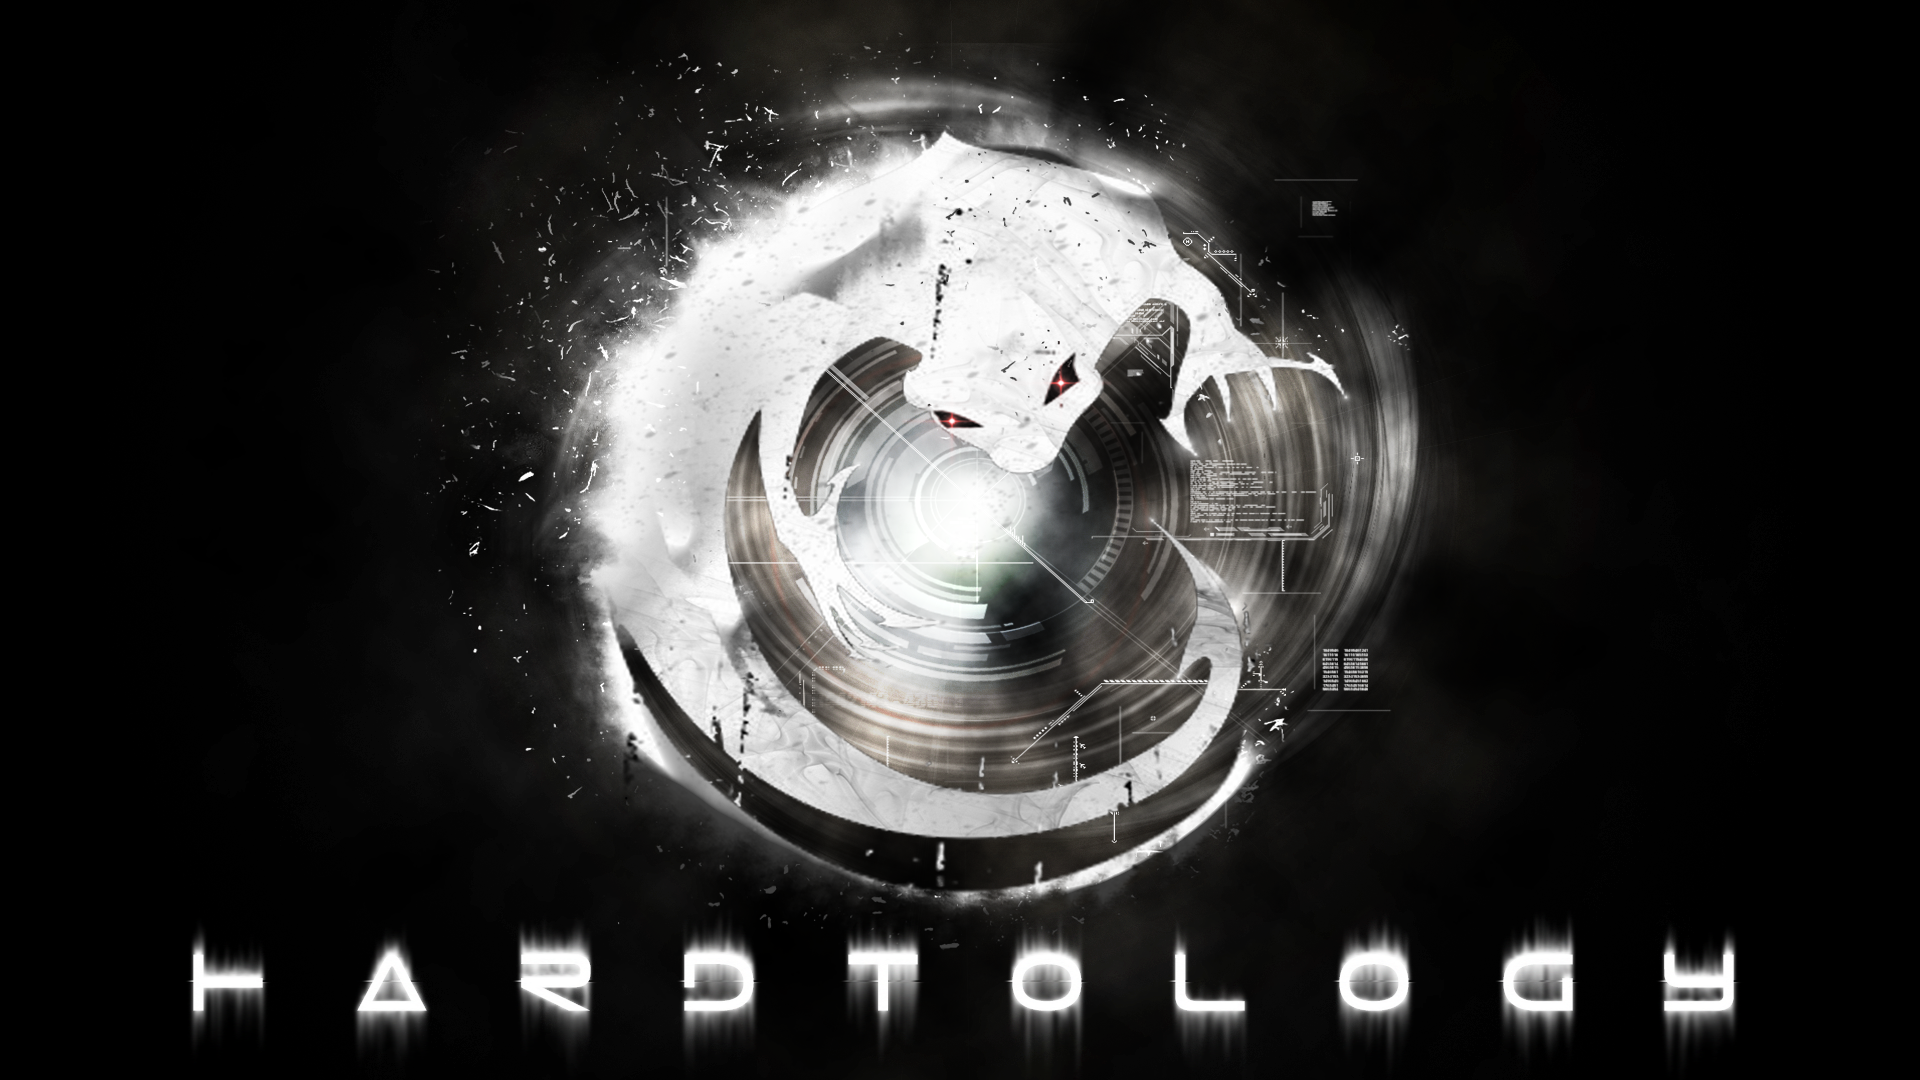 Hardtology (Wallpaper) by Hardii